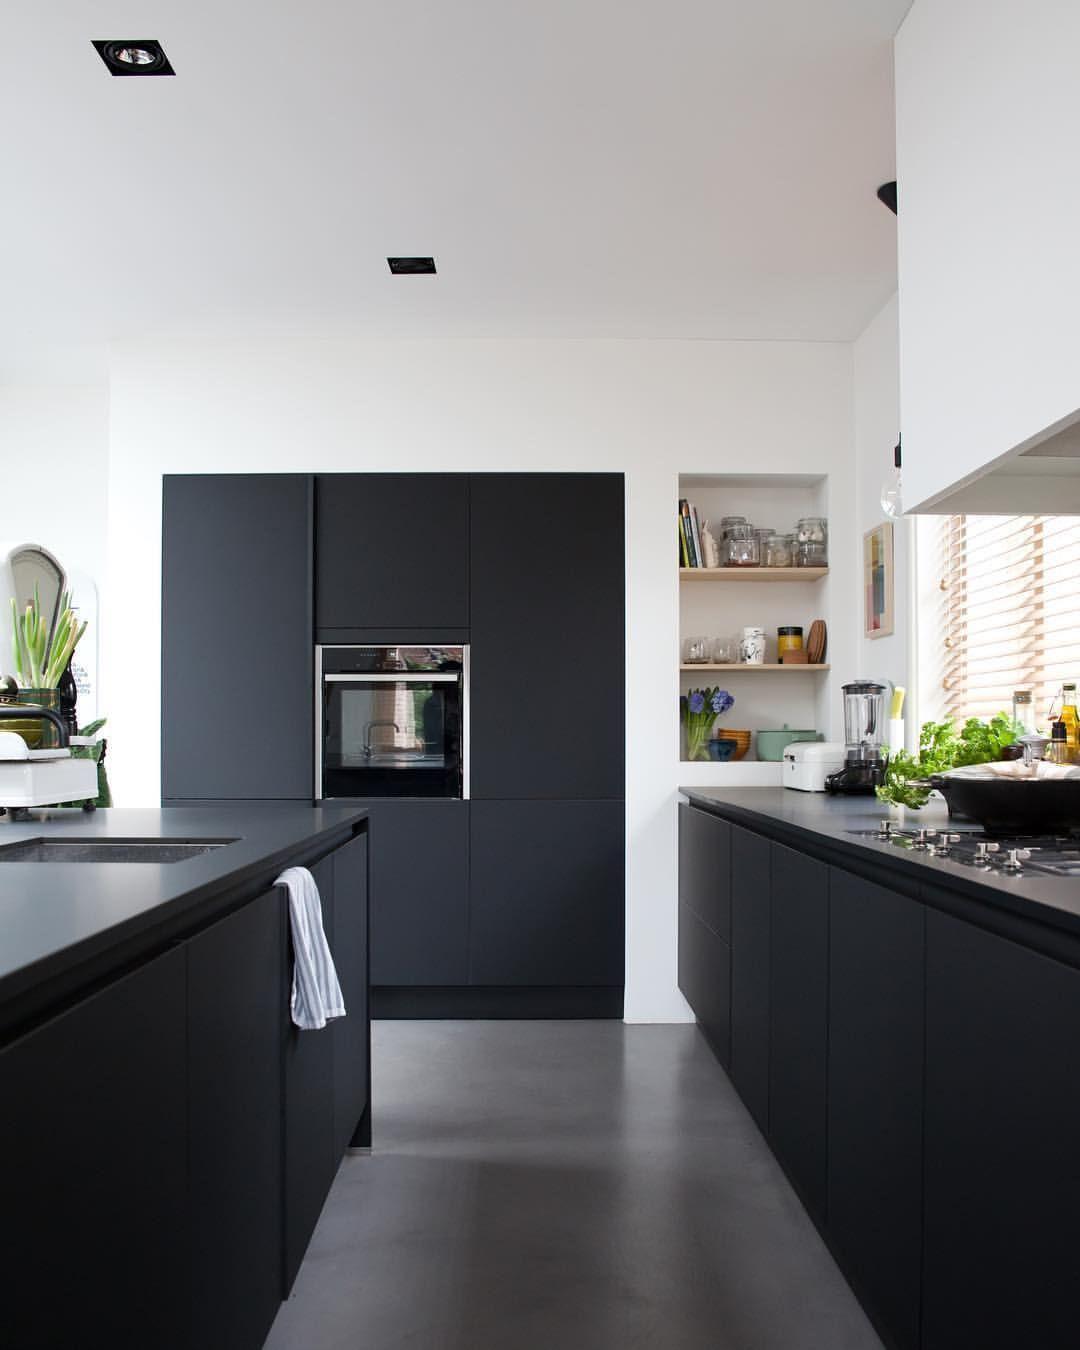 Minimalist House 85 Design: 11+ Bewitching Minimalist Furniture Clutter Ideas In 2020